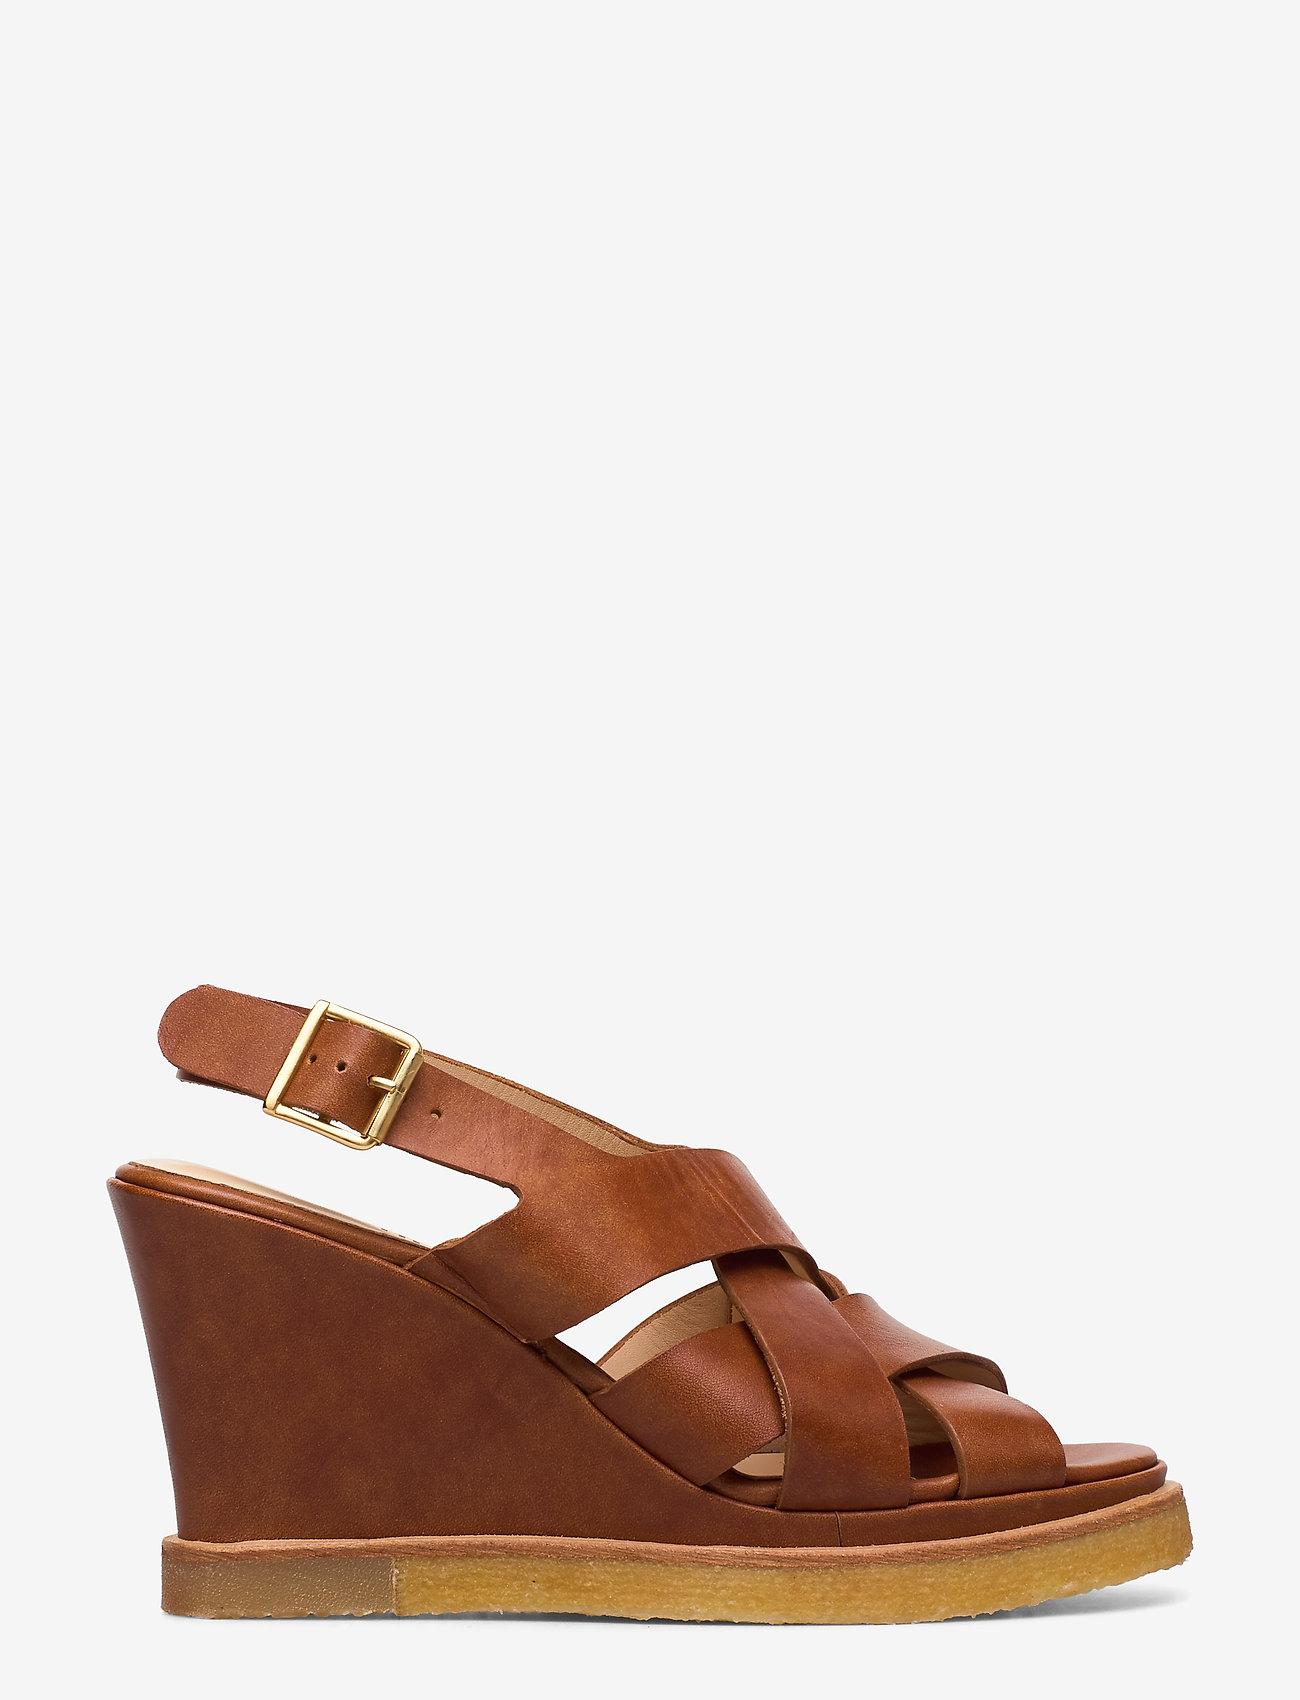 ANGULUS - Sandals - wedge - wedges - 1789 tan - 1